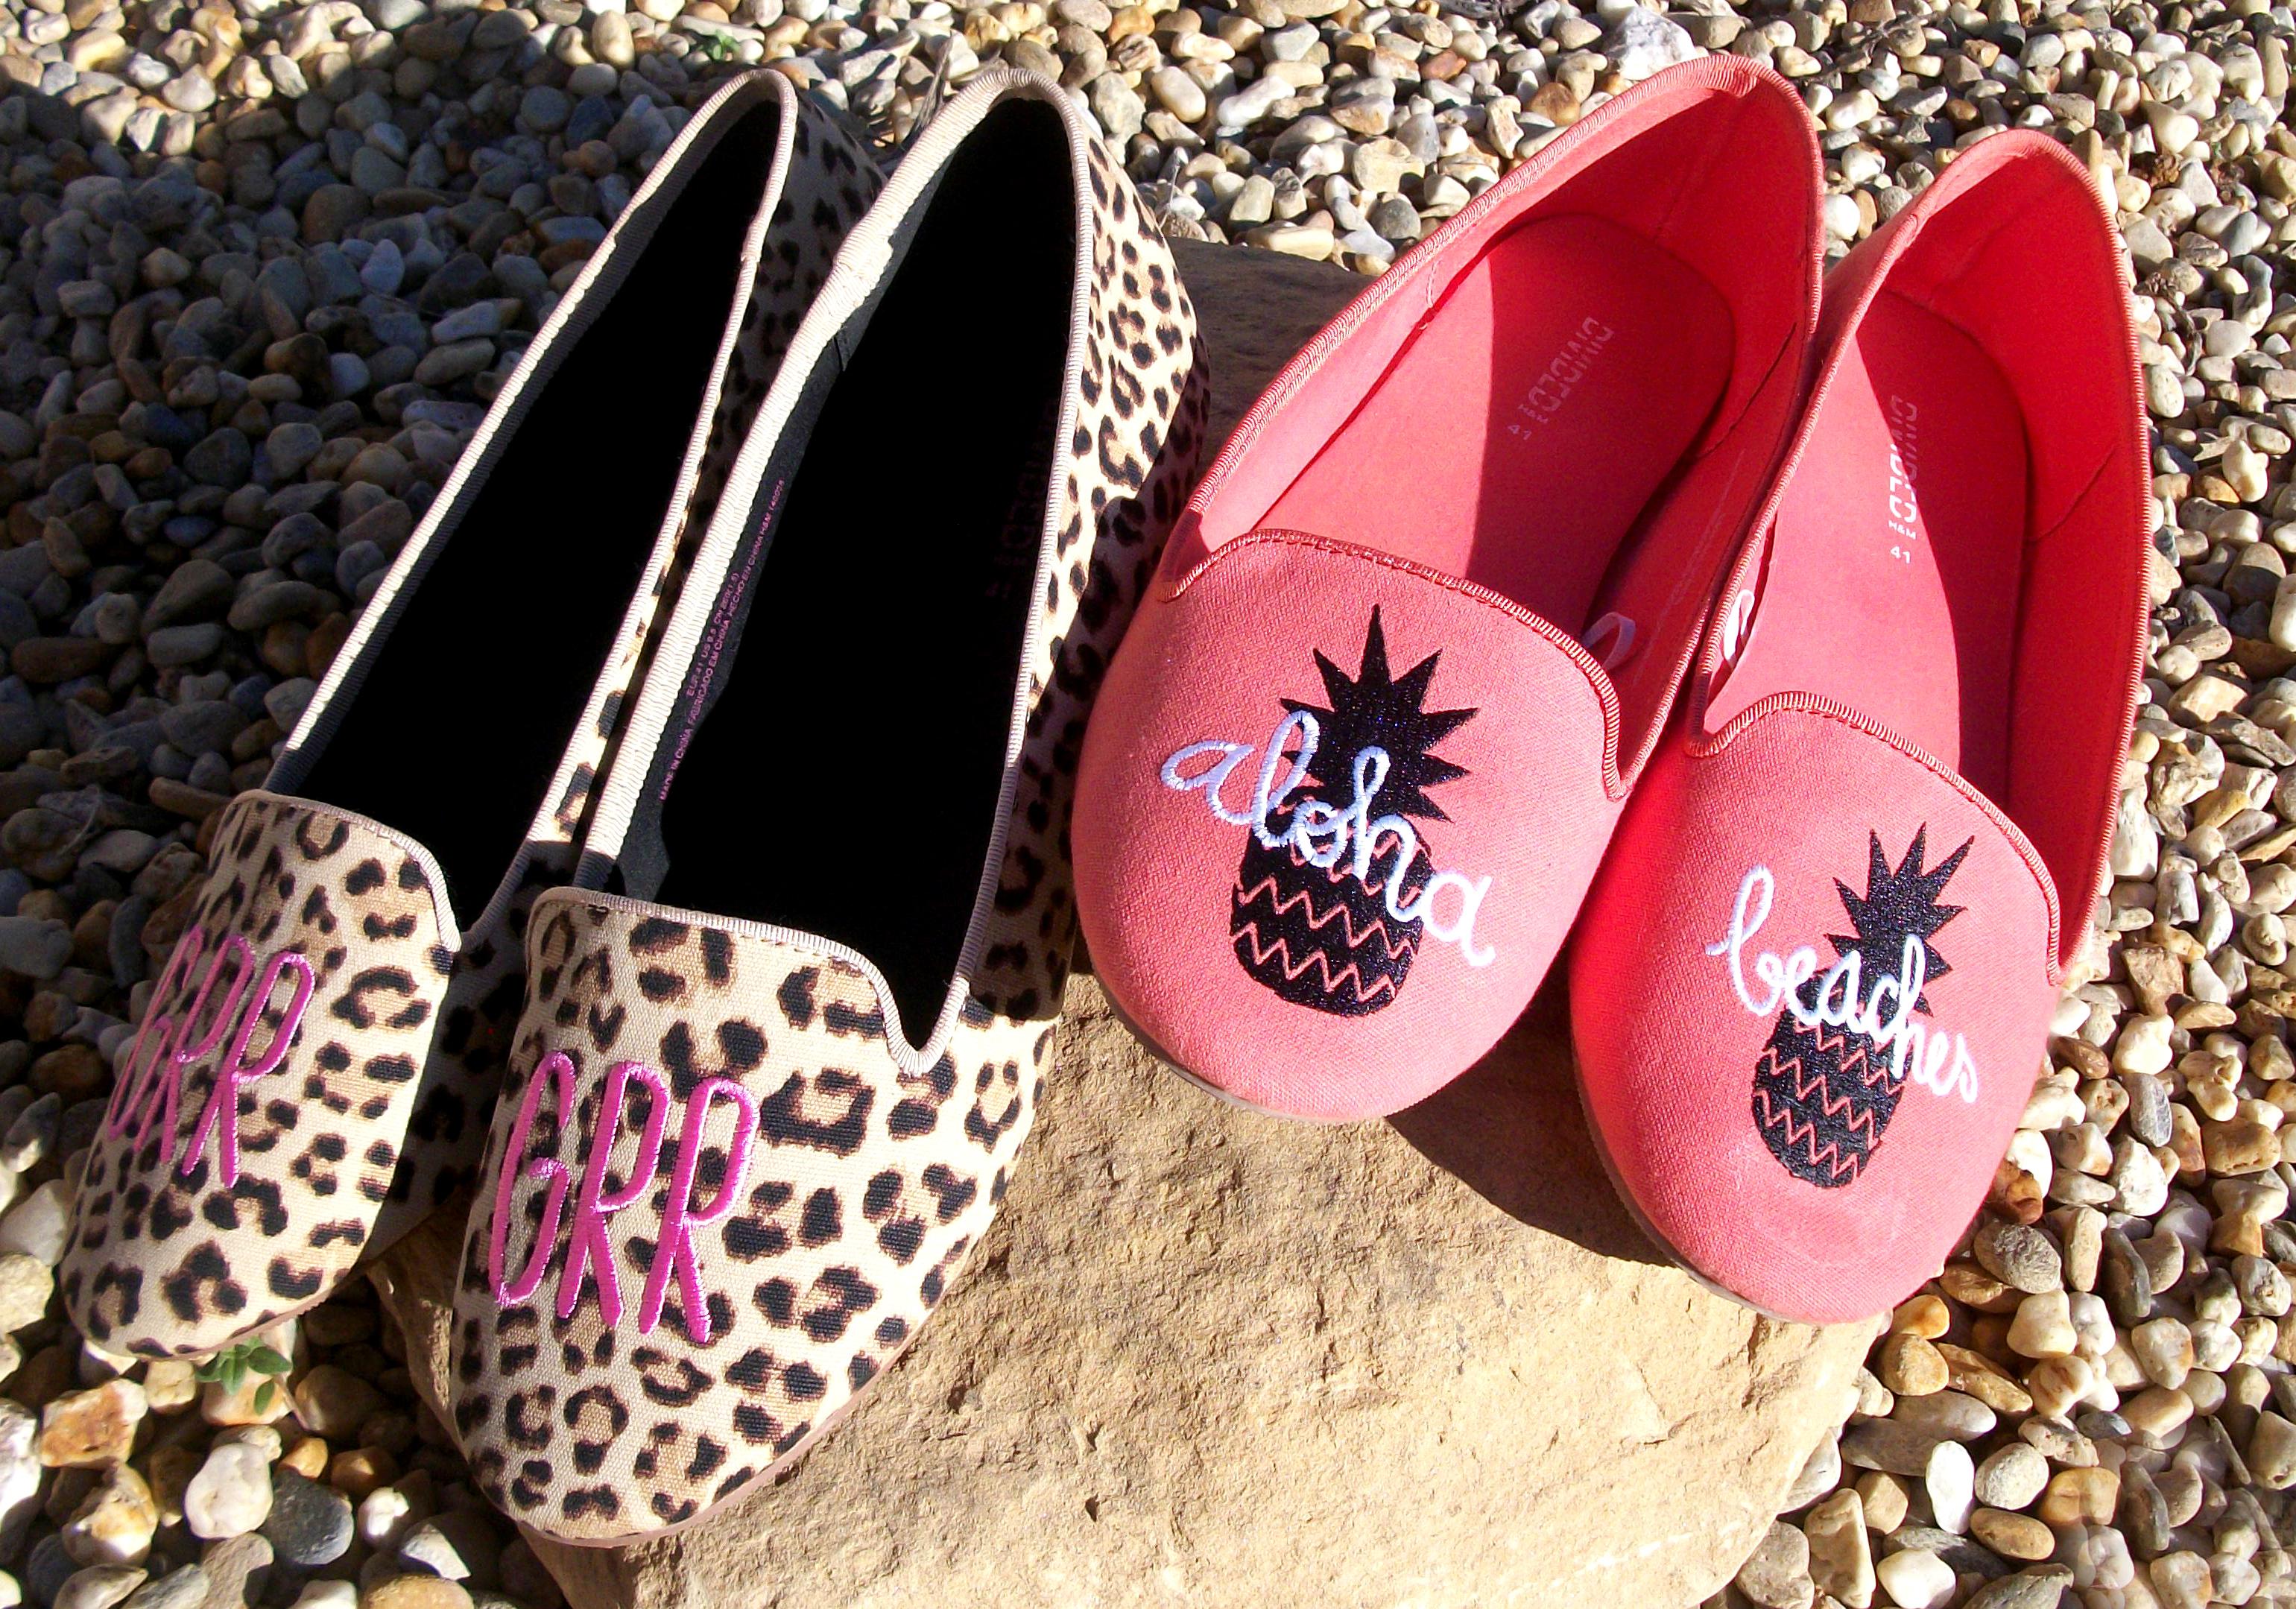 slippers-bordados-emoji-desenhos-frases-acessorios-trend-tendencia